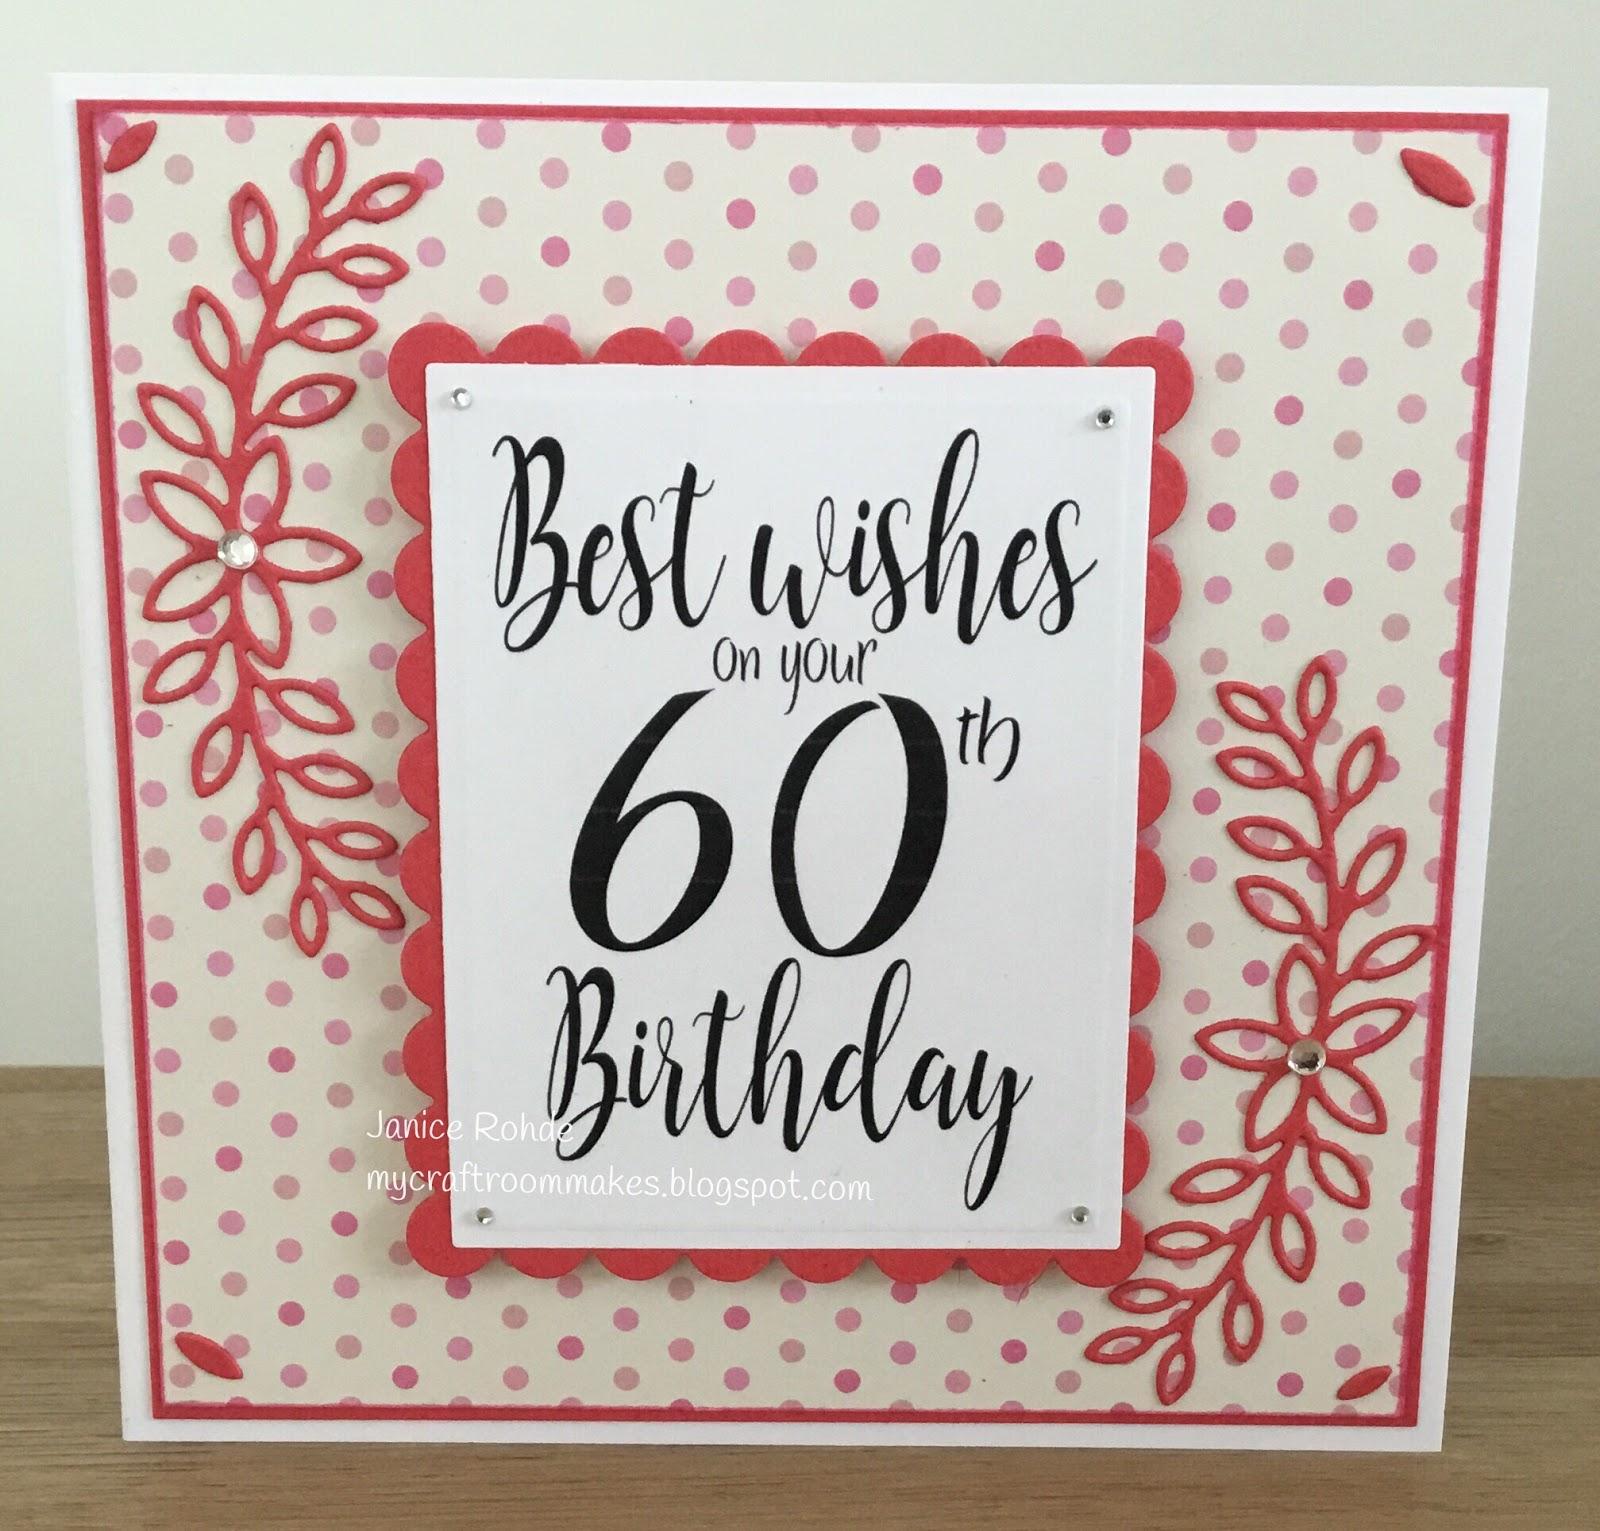 My Craft Room Makes 60th Birthday Card